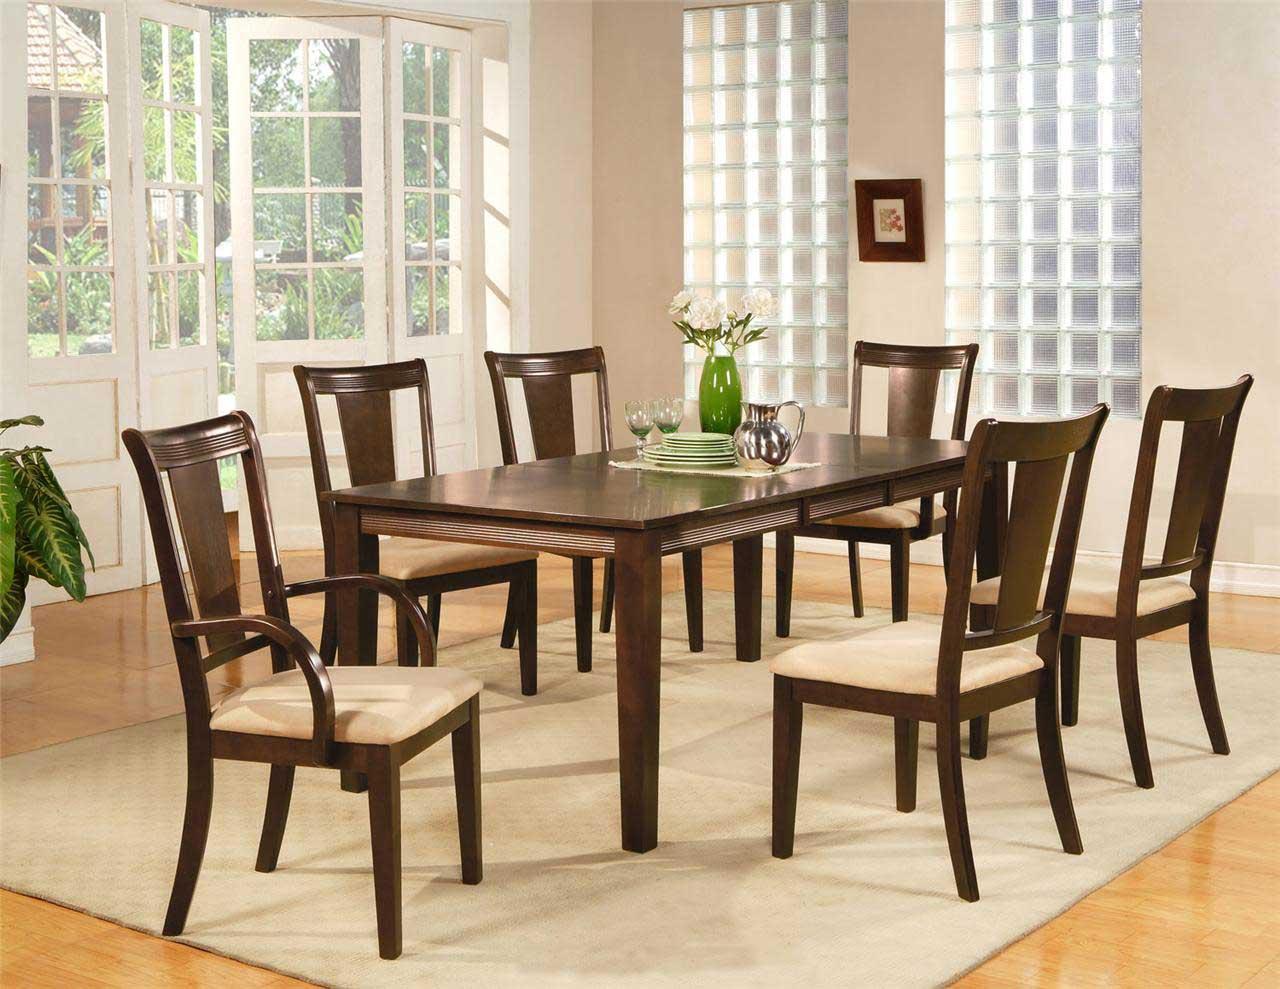 Stunning Simple Dining Room Design Ideas simple dining room design